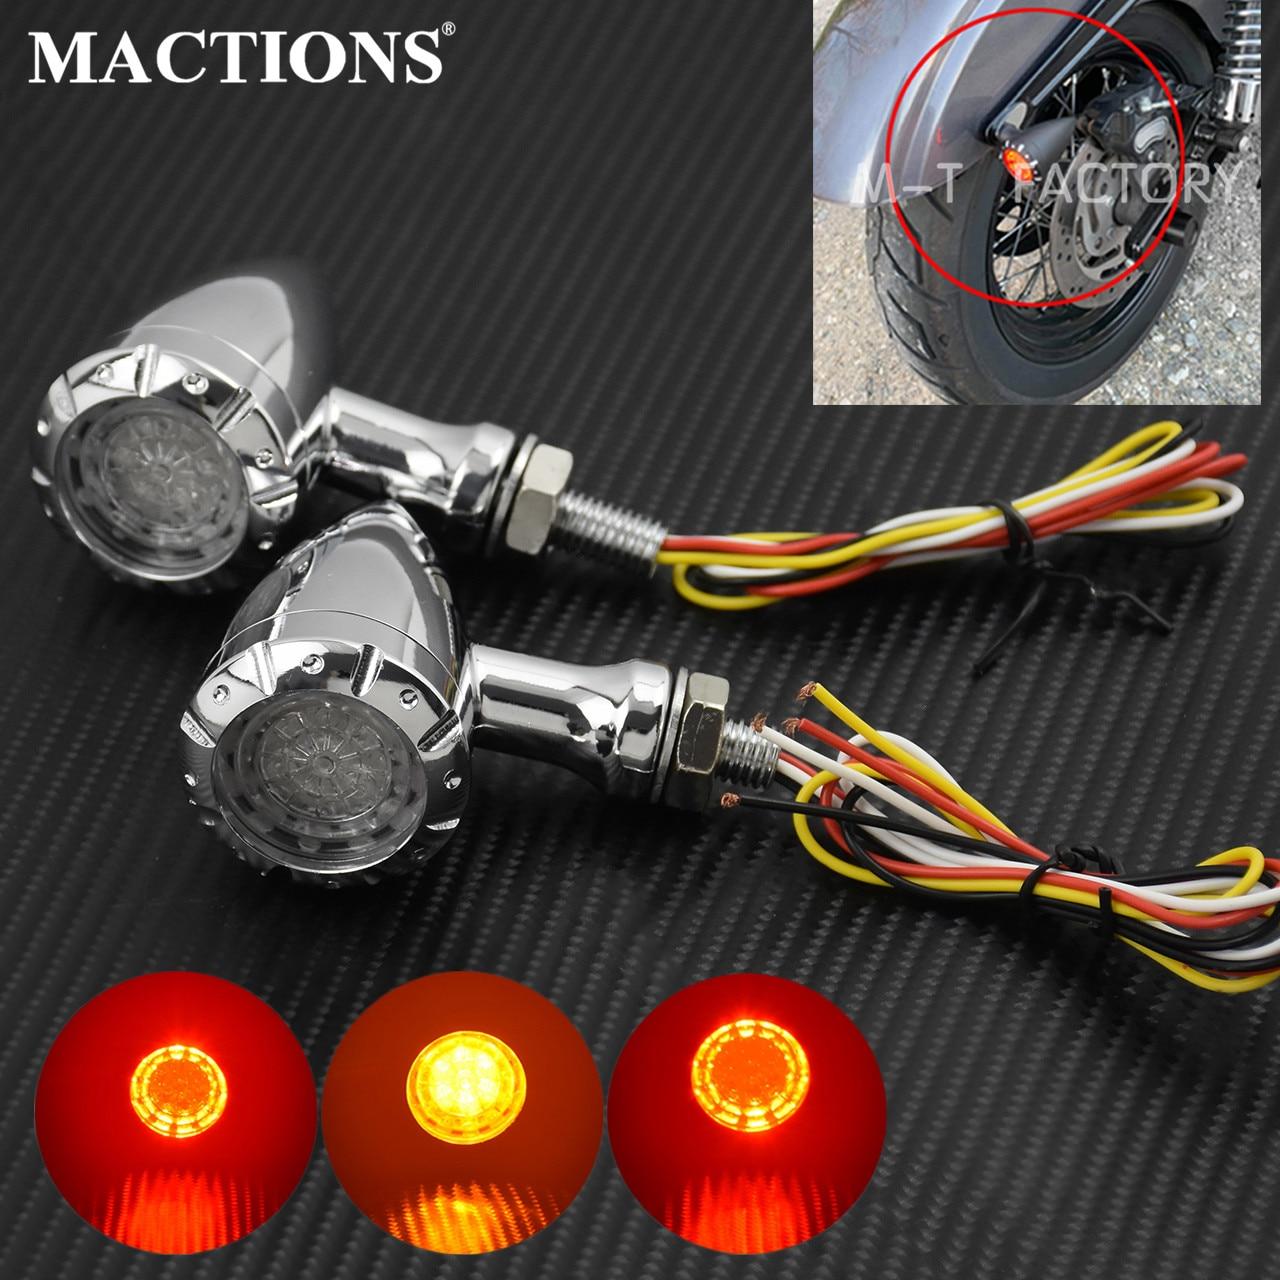 2pcs Motorcycle Red Lamp Turn Signals Brake Indicator for Yamaha Harley Chopper